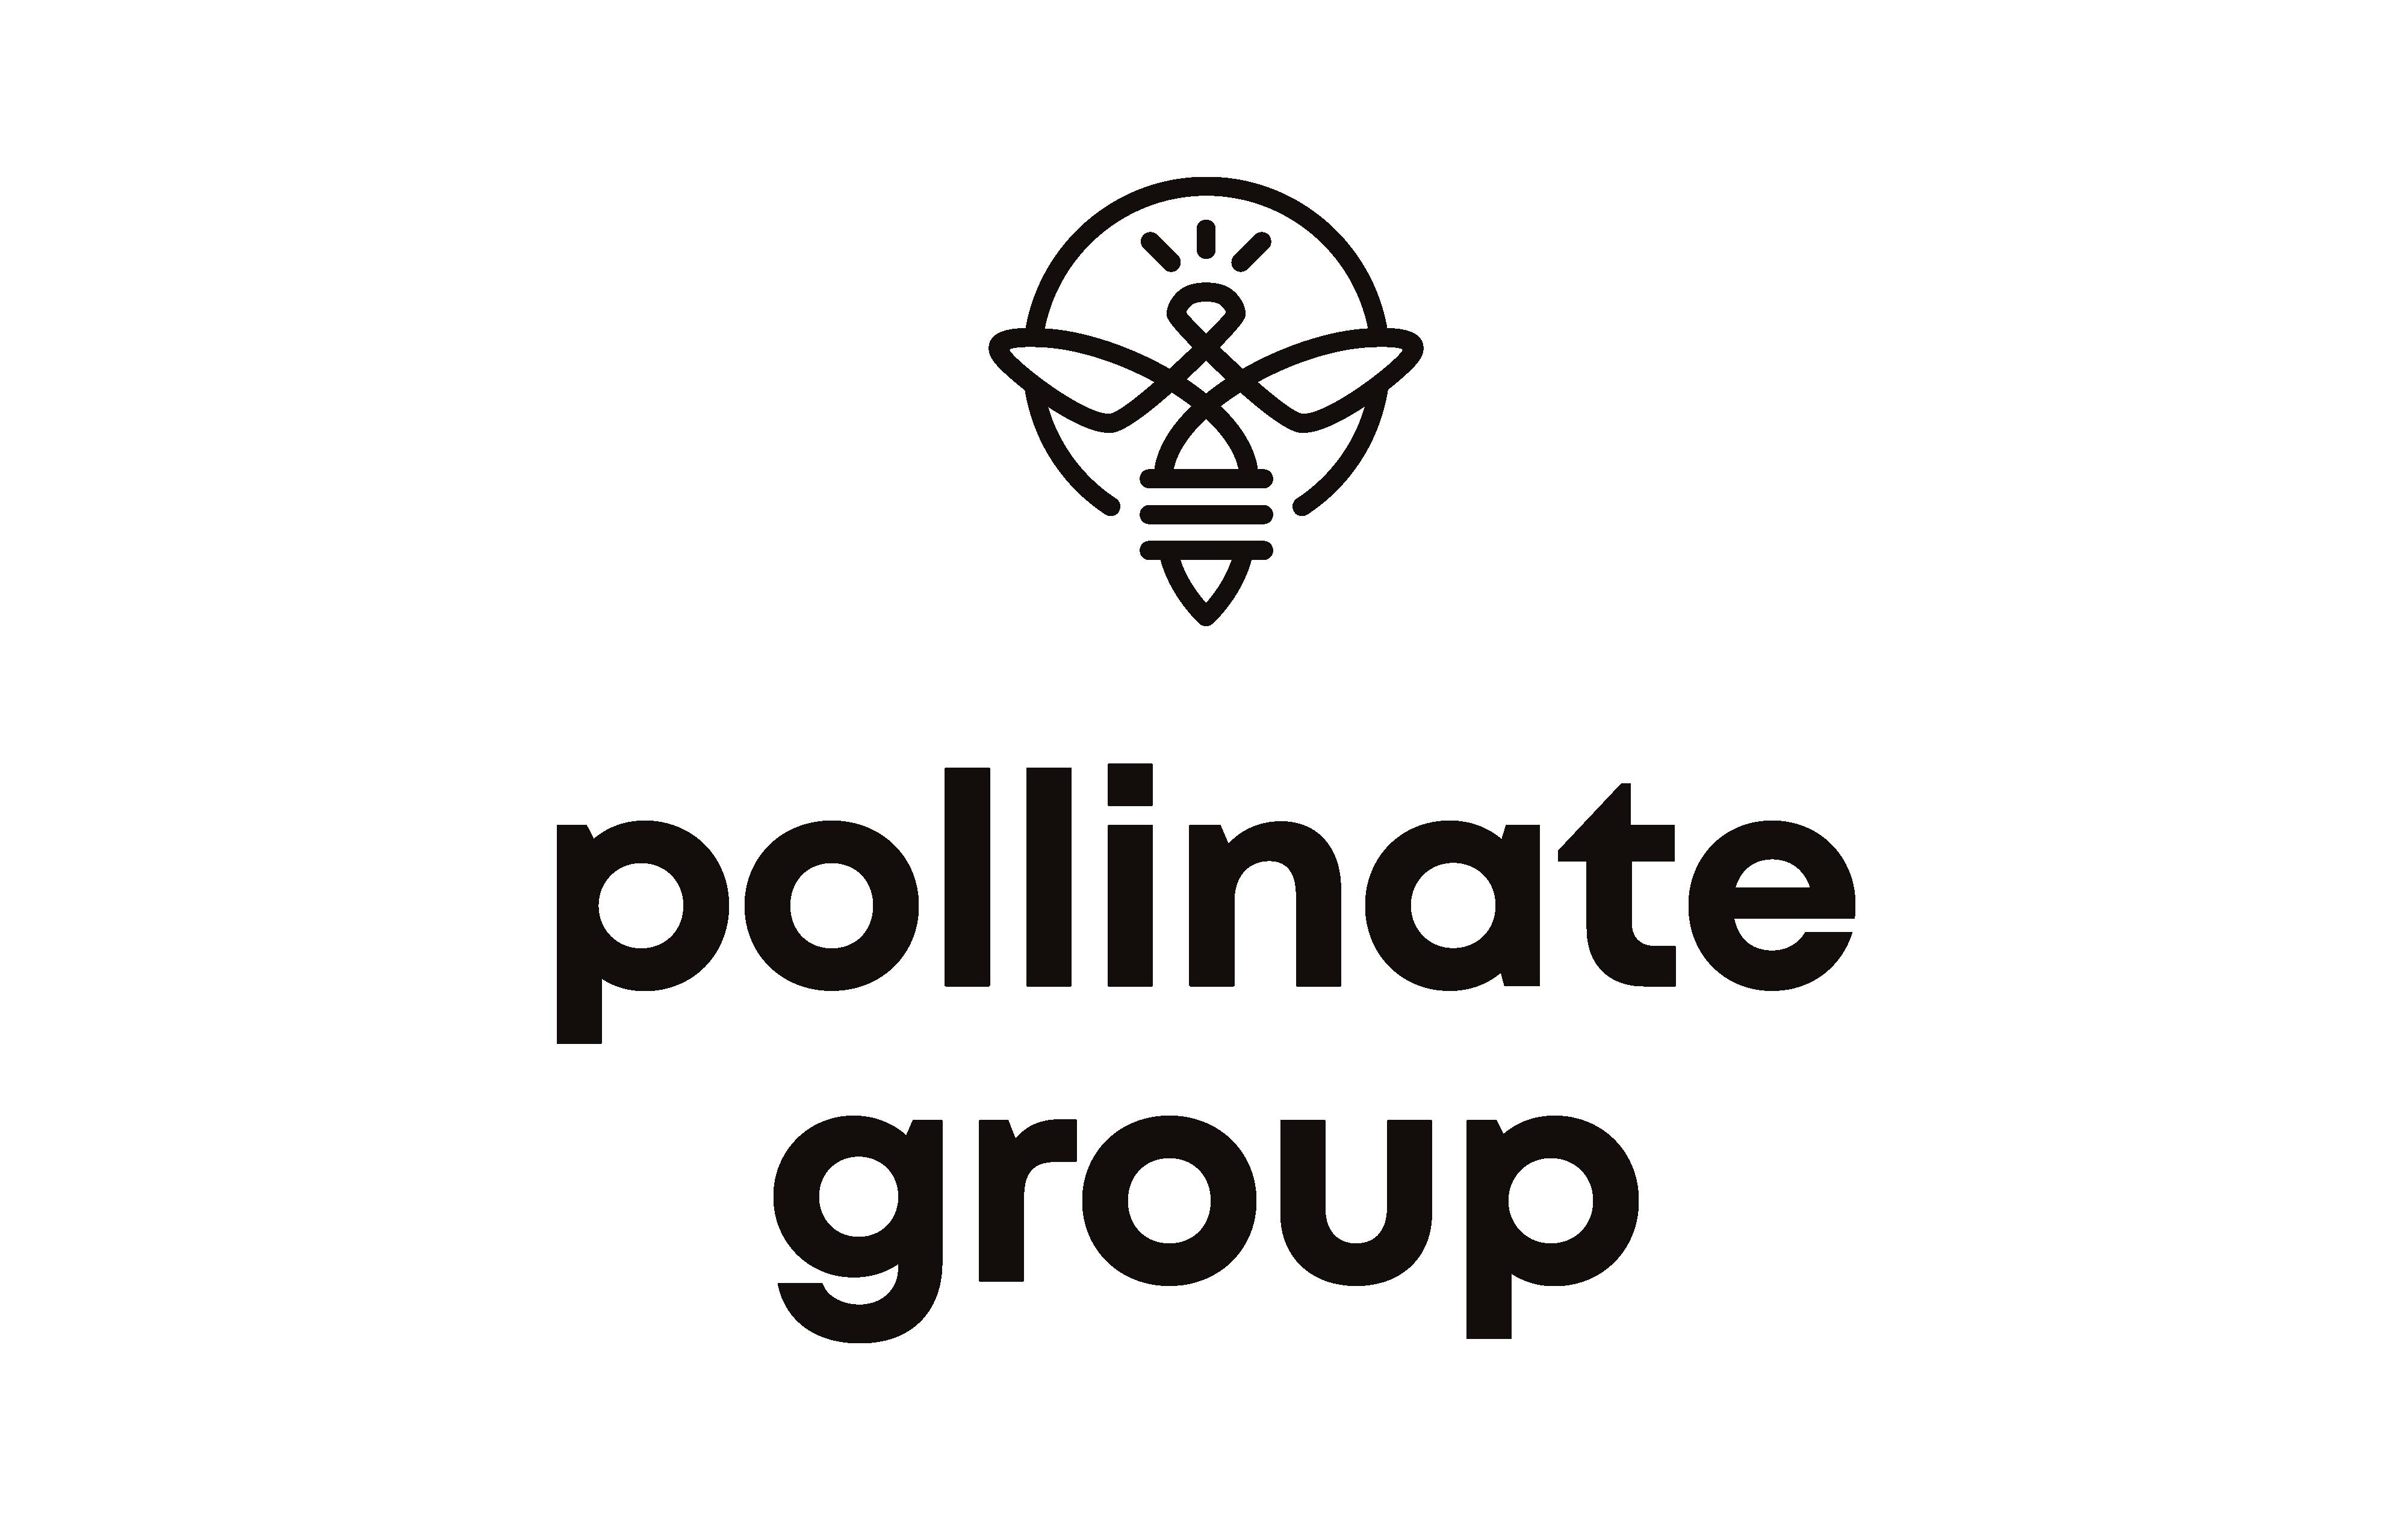 Pollinate Group logo - JFH